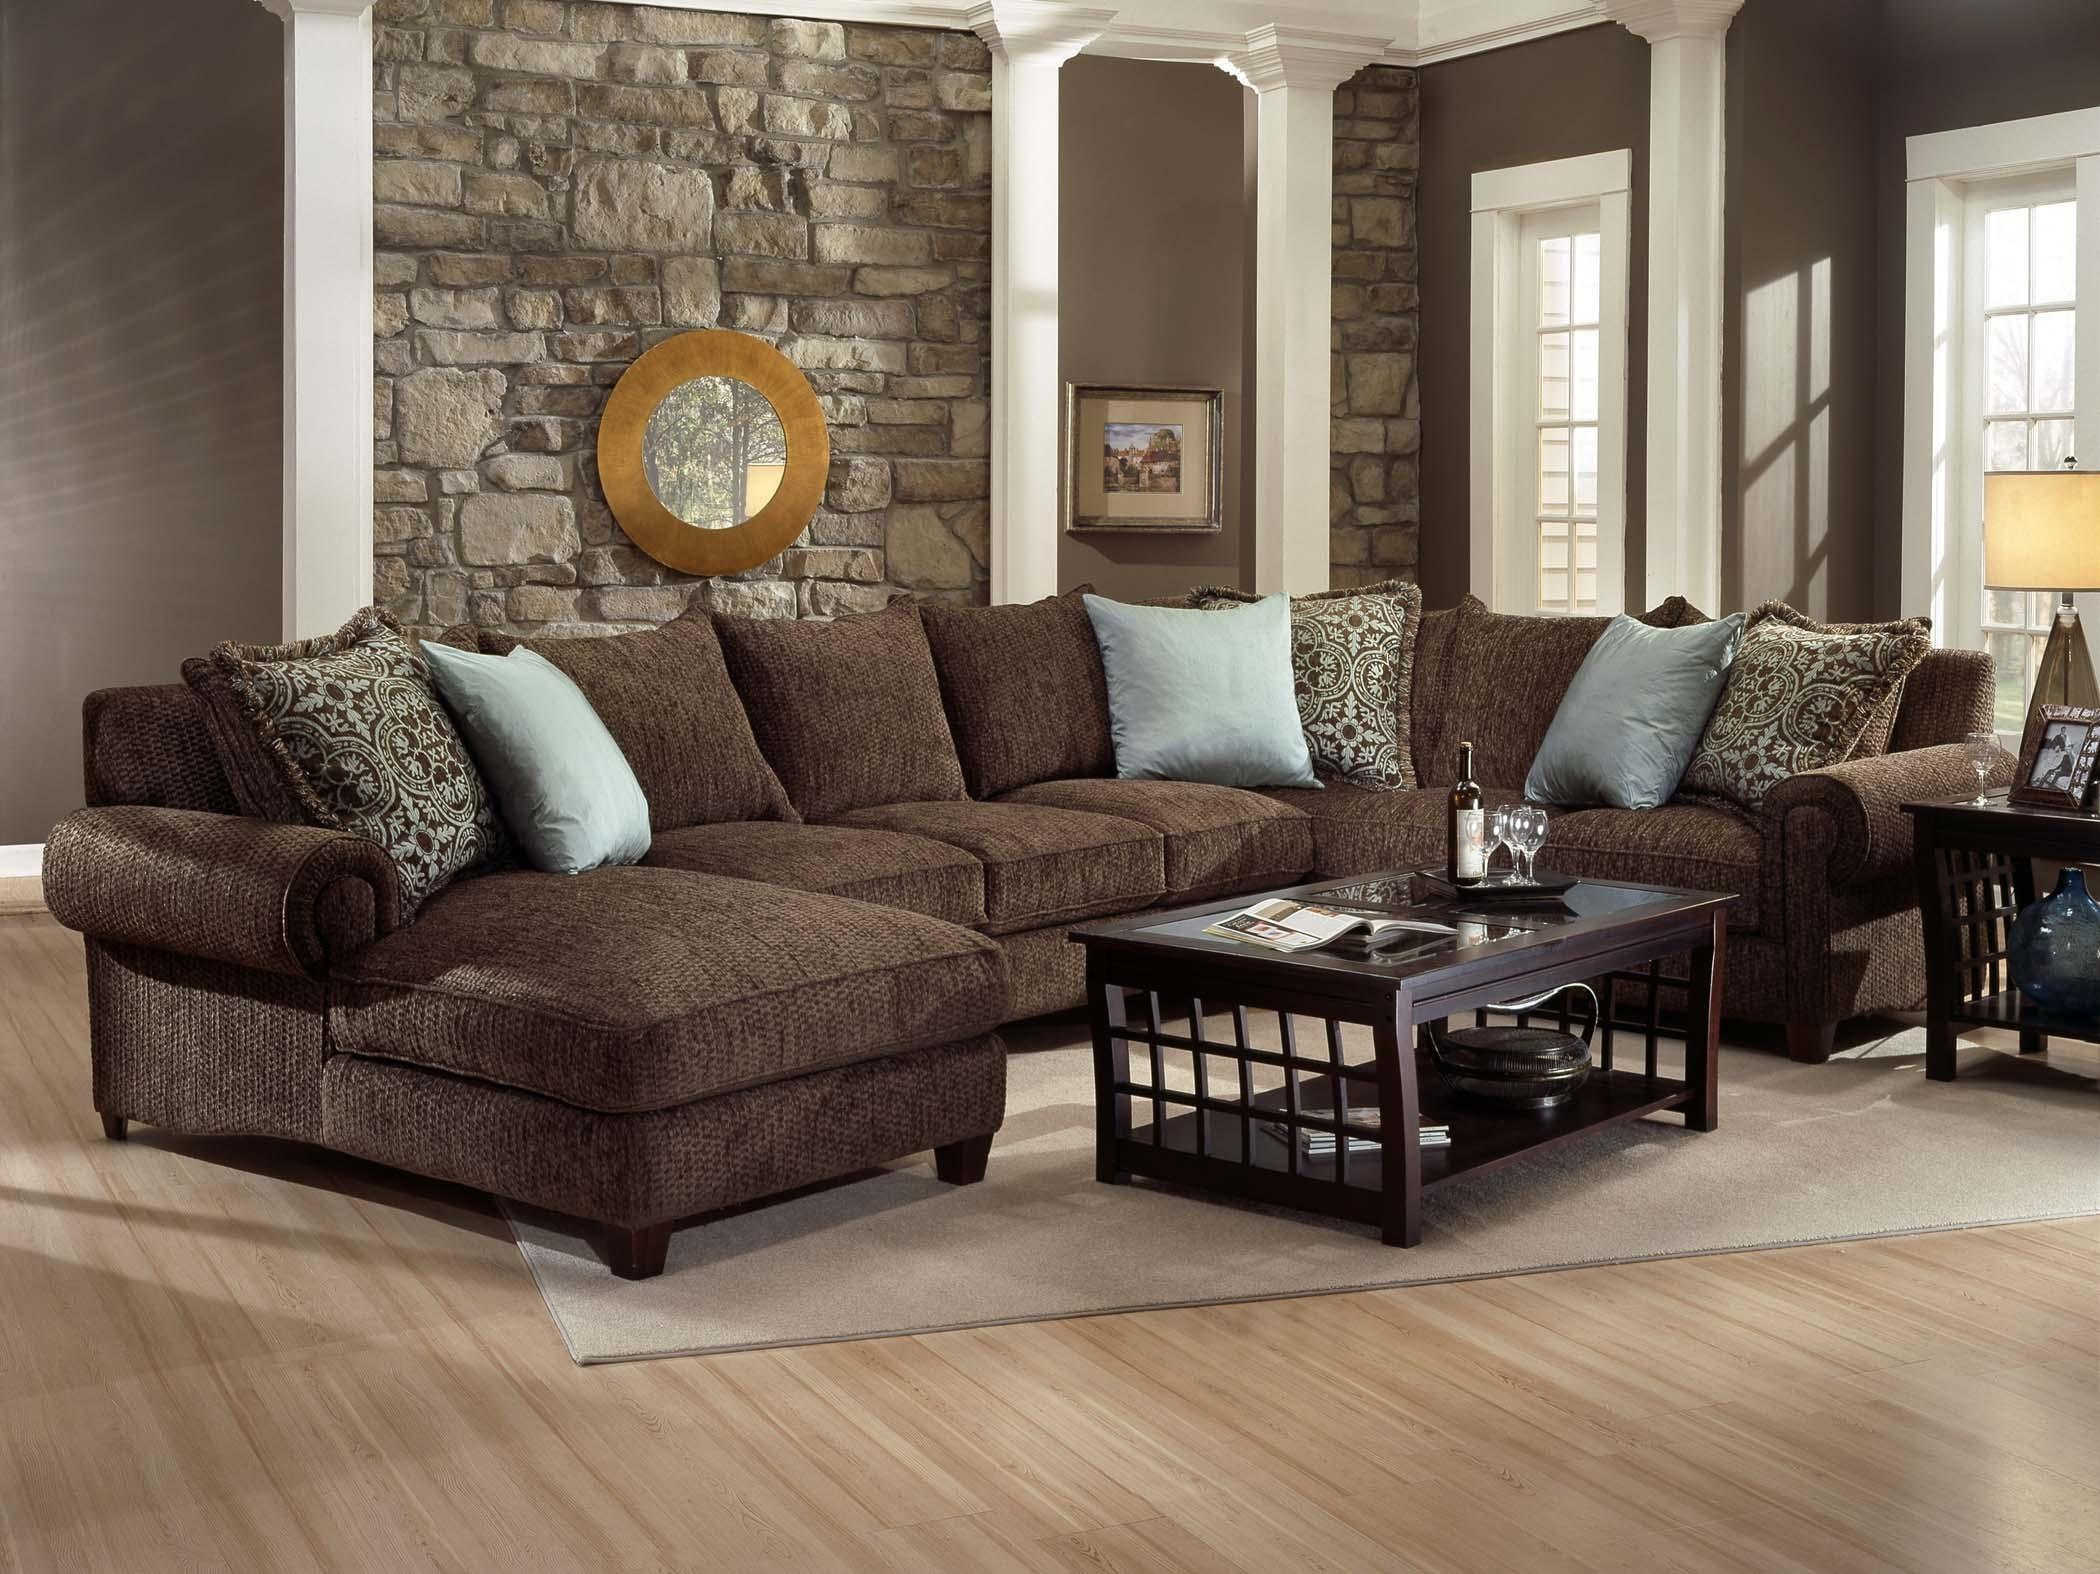 Sectional Sofa Design: Wonderful Sectional Sofas Denver Best Leather Regarding Denver Sectional Sofas (Image 9 of 10)